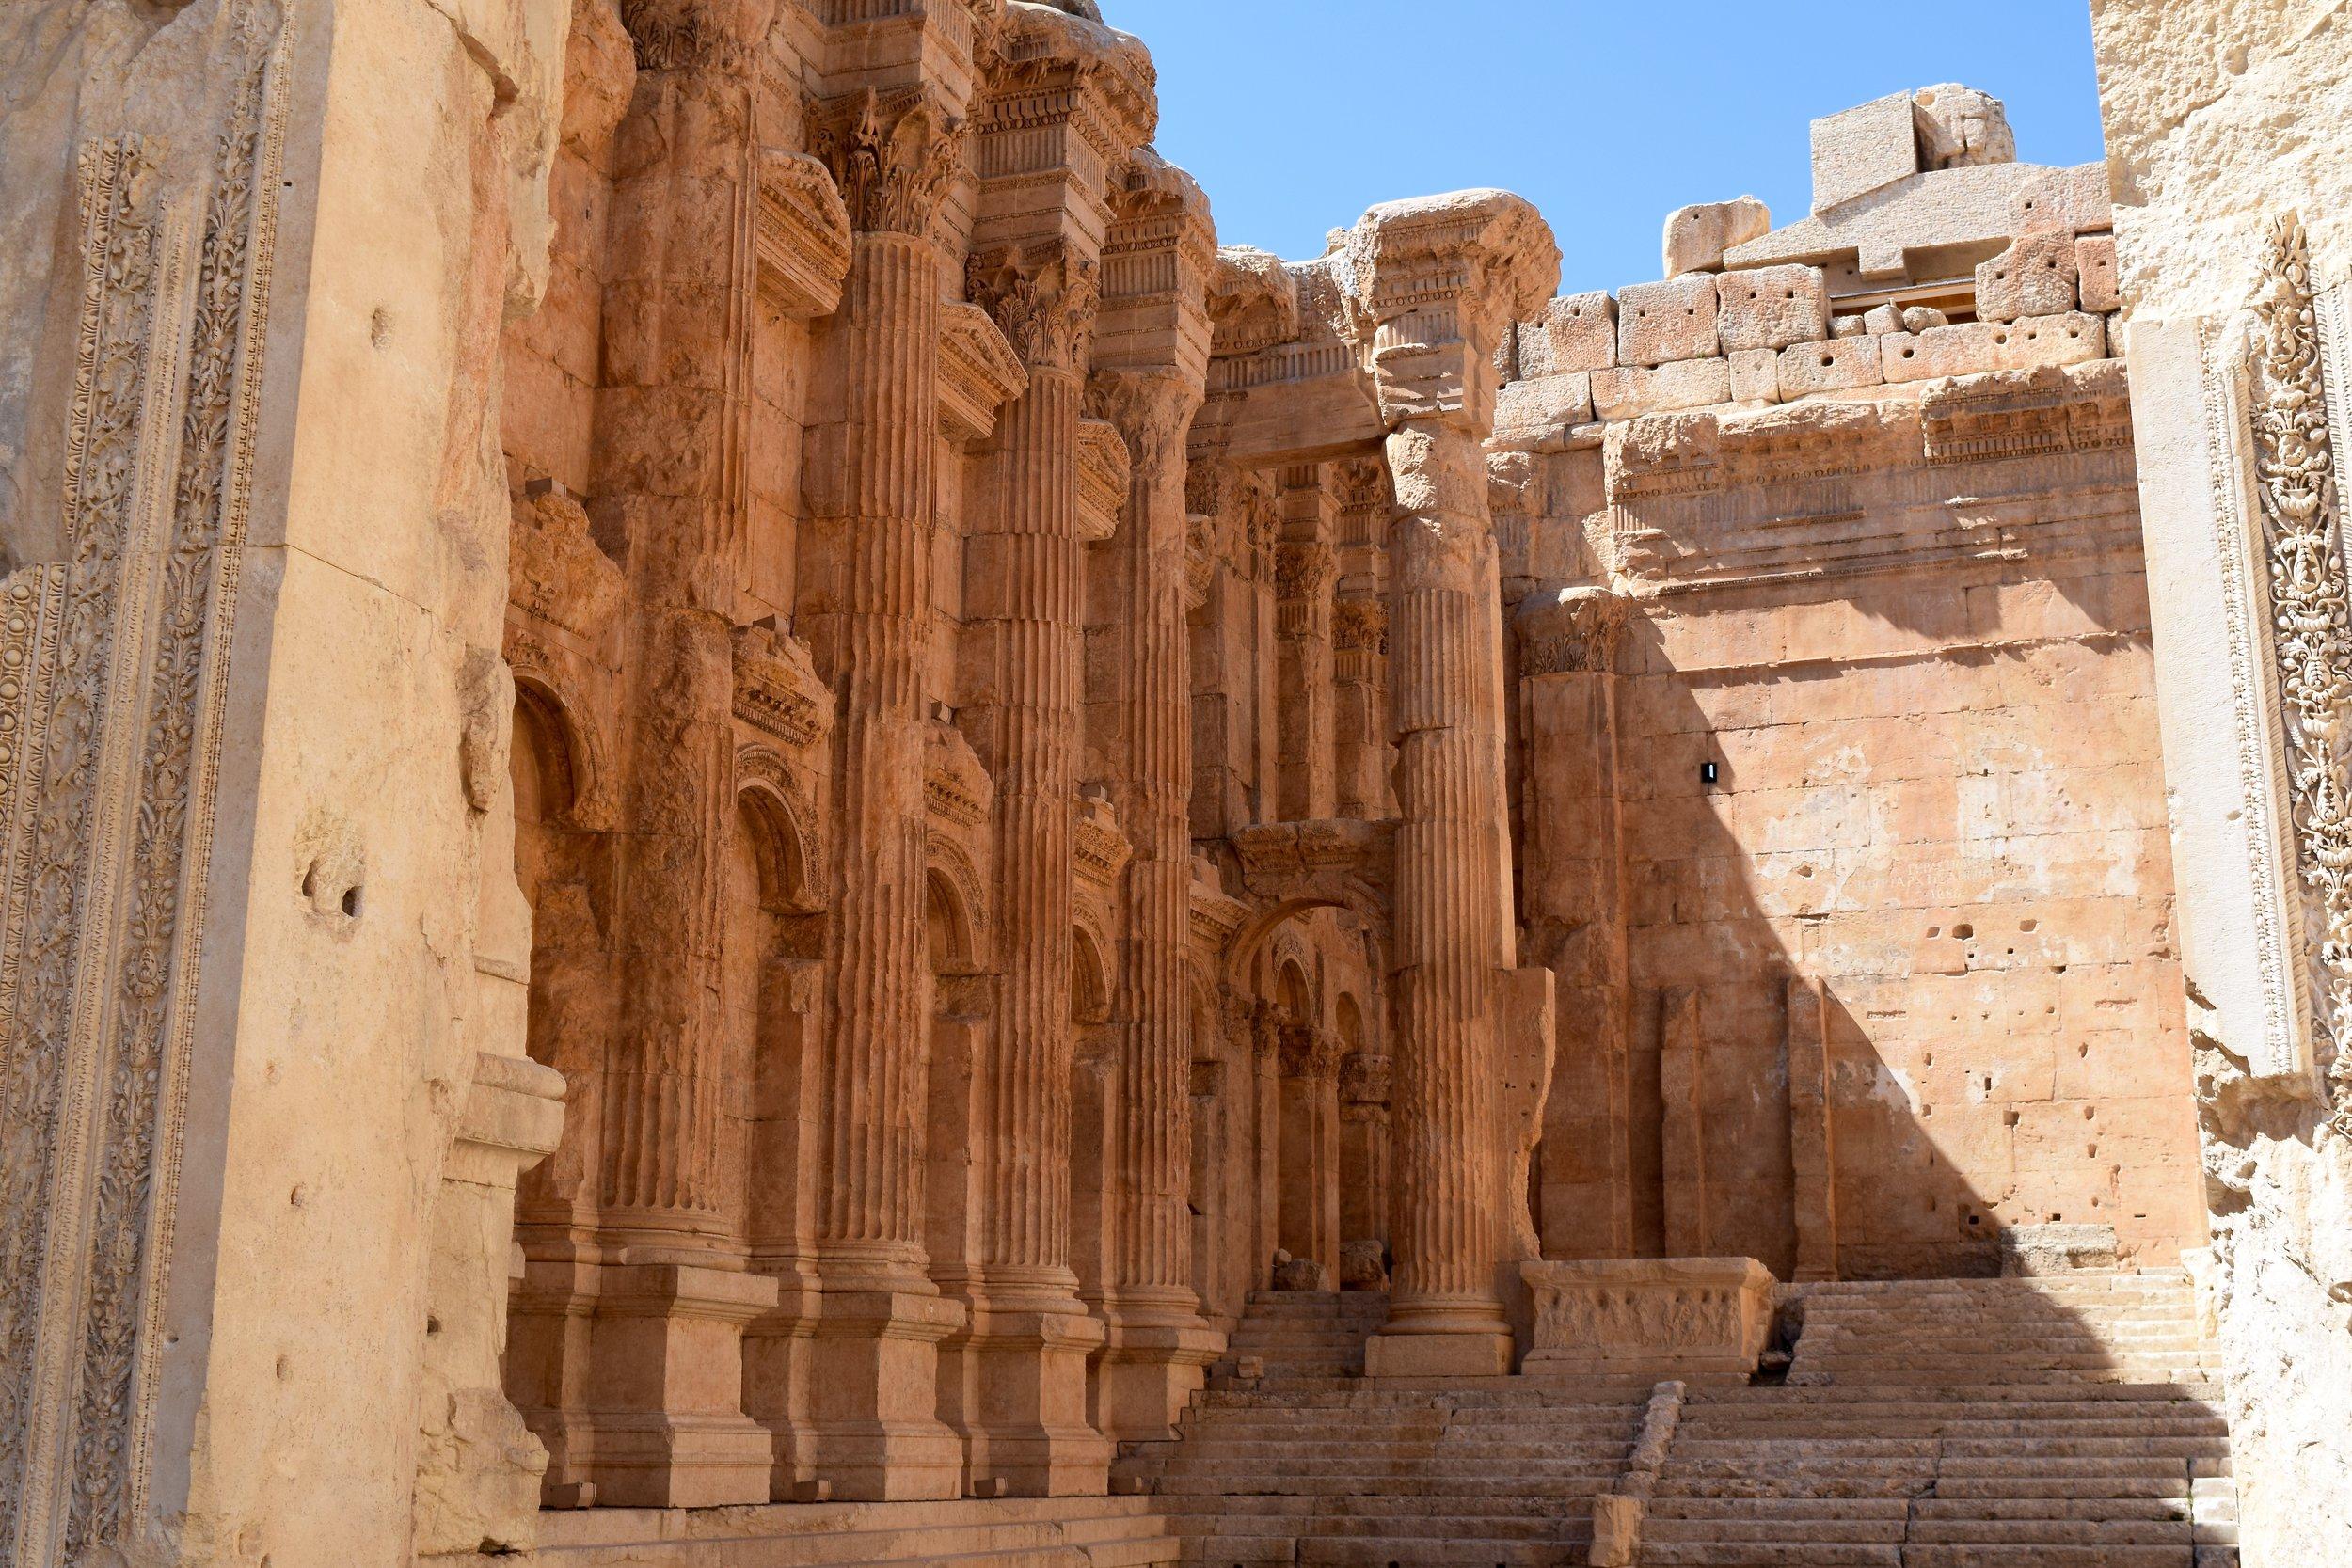 Inside of the Temple of Bacchus, Baalbek